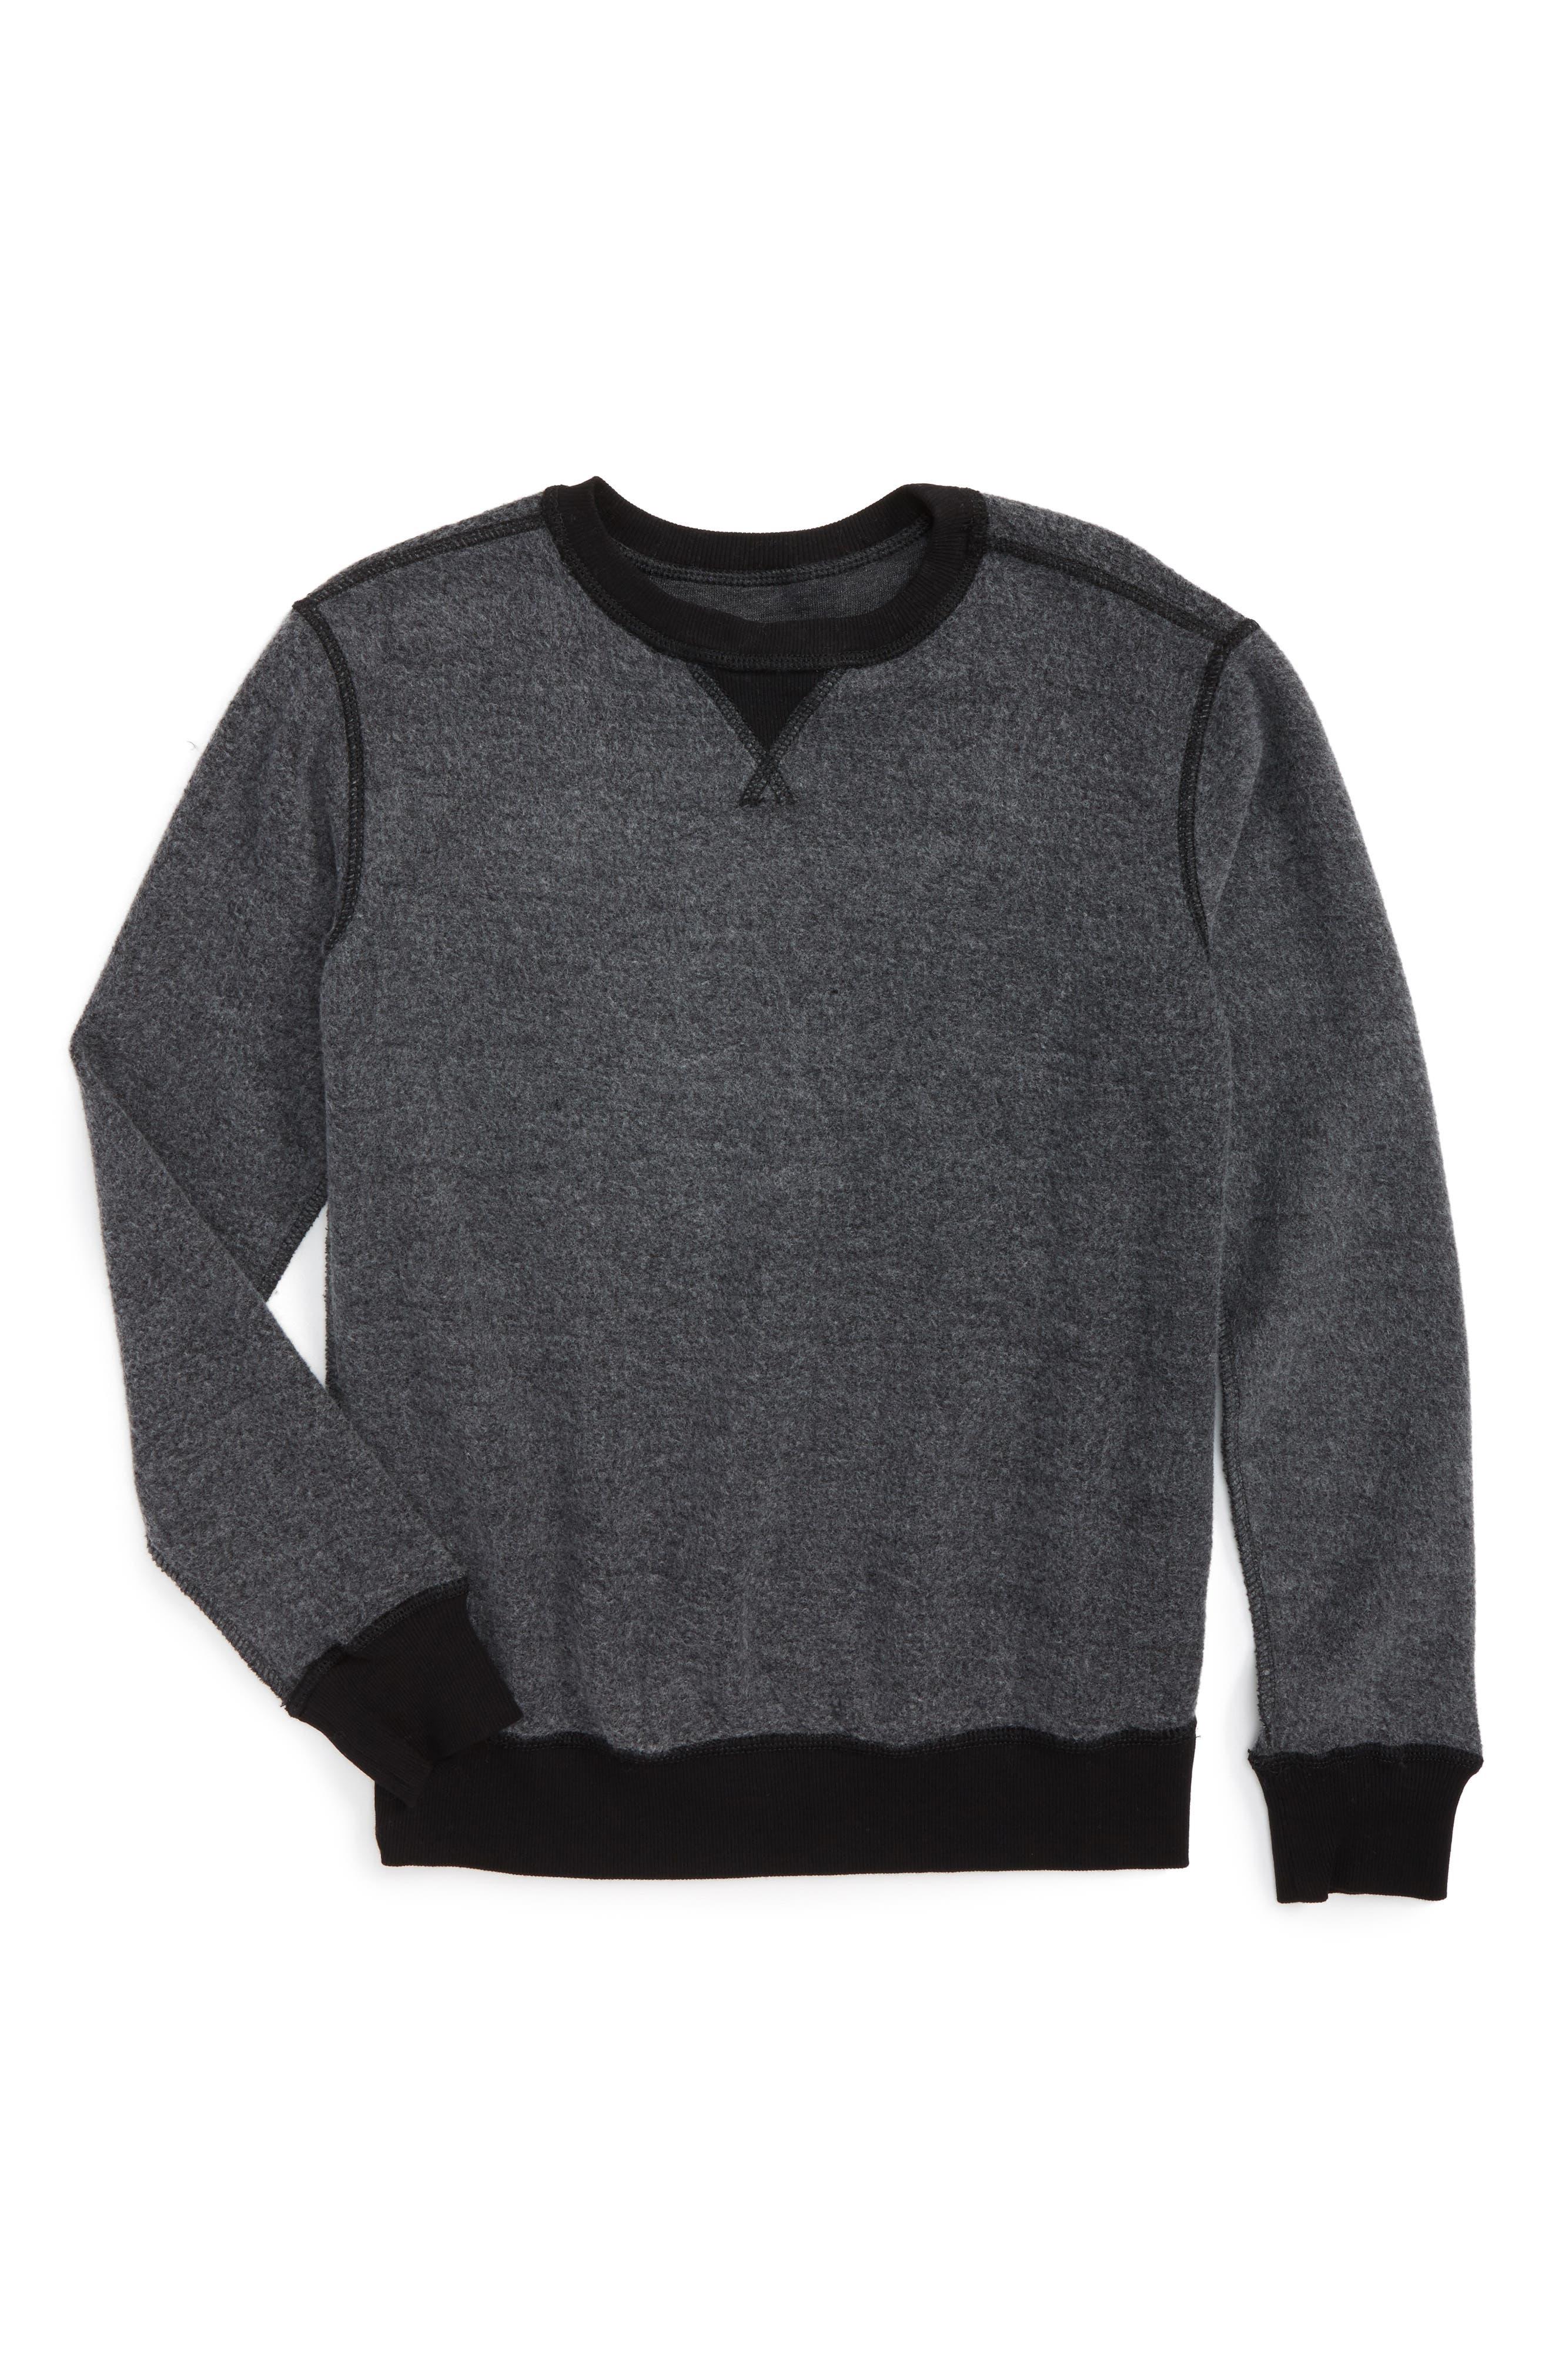 Reverse Crewneck Sweatshirt,                             Main thumbnail 1, color,                             Grey Charcoal Heather